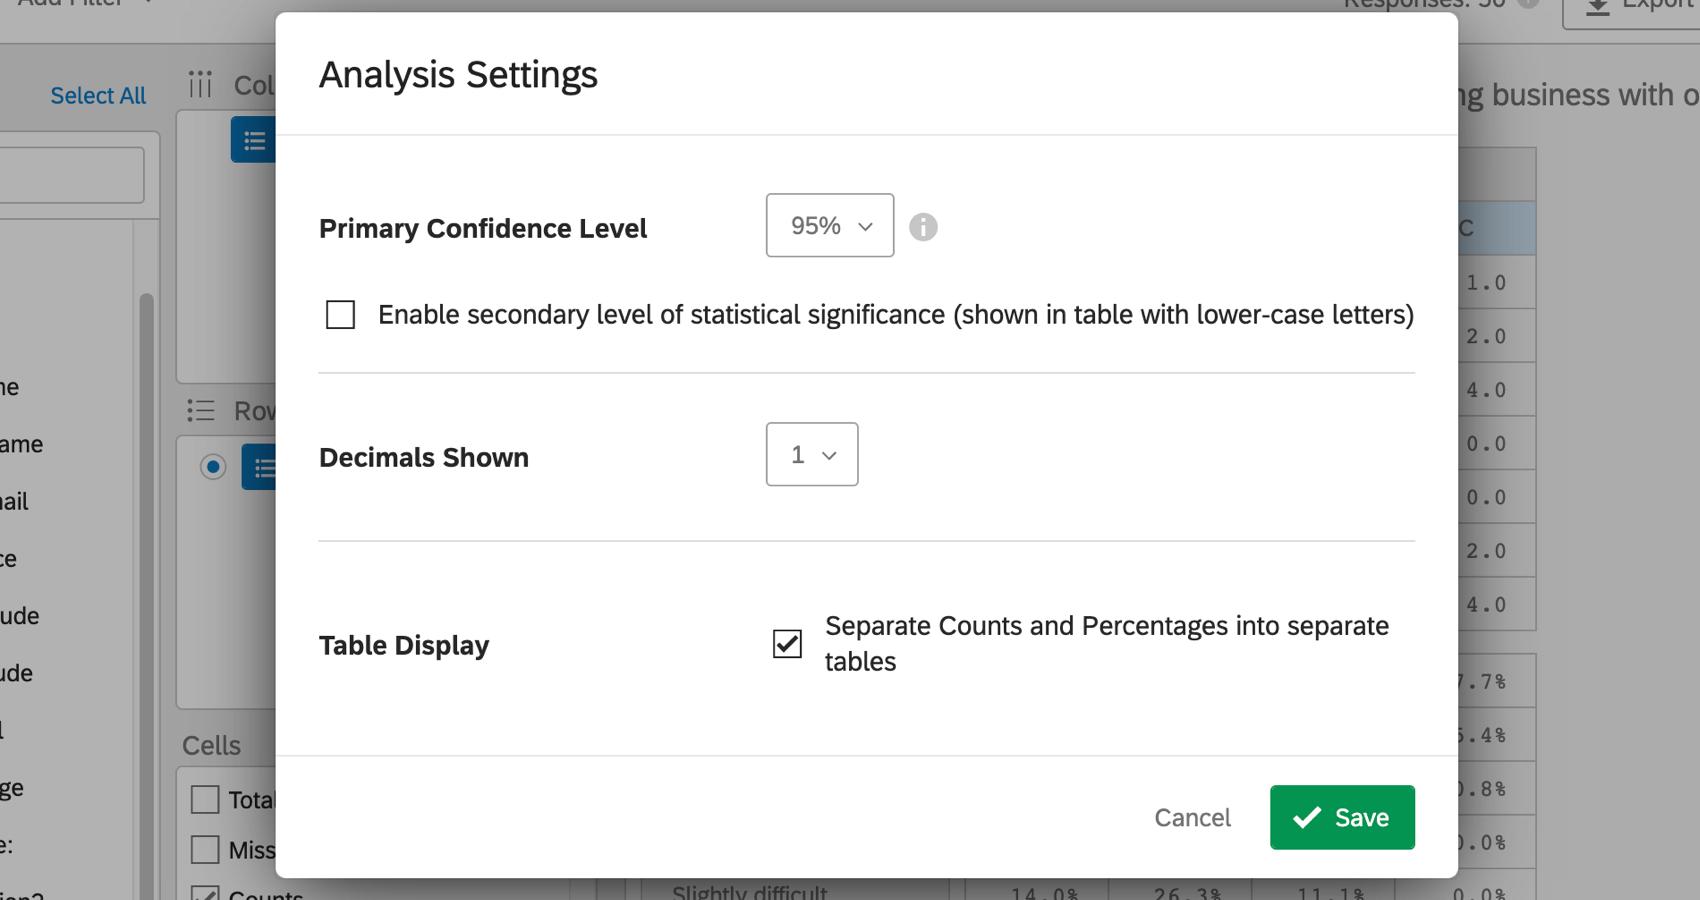 Screenshot of analysis settings menu with options described